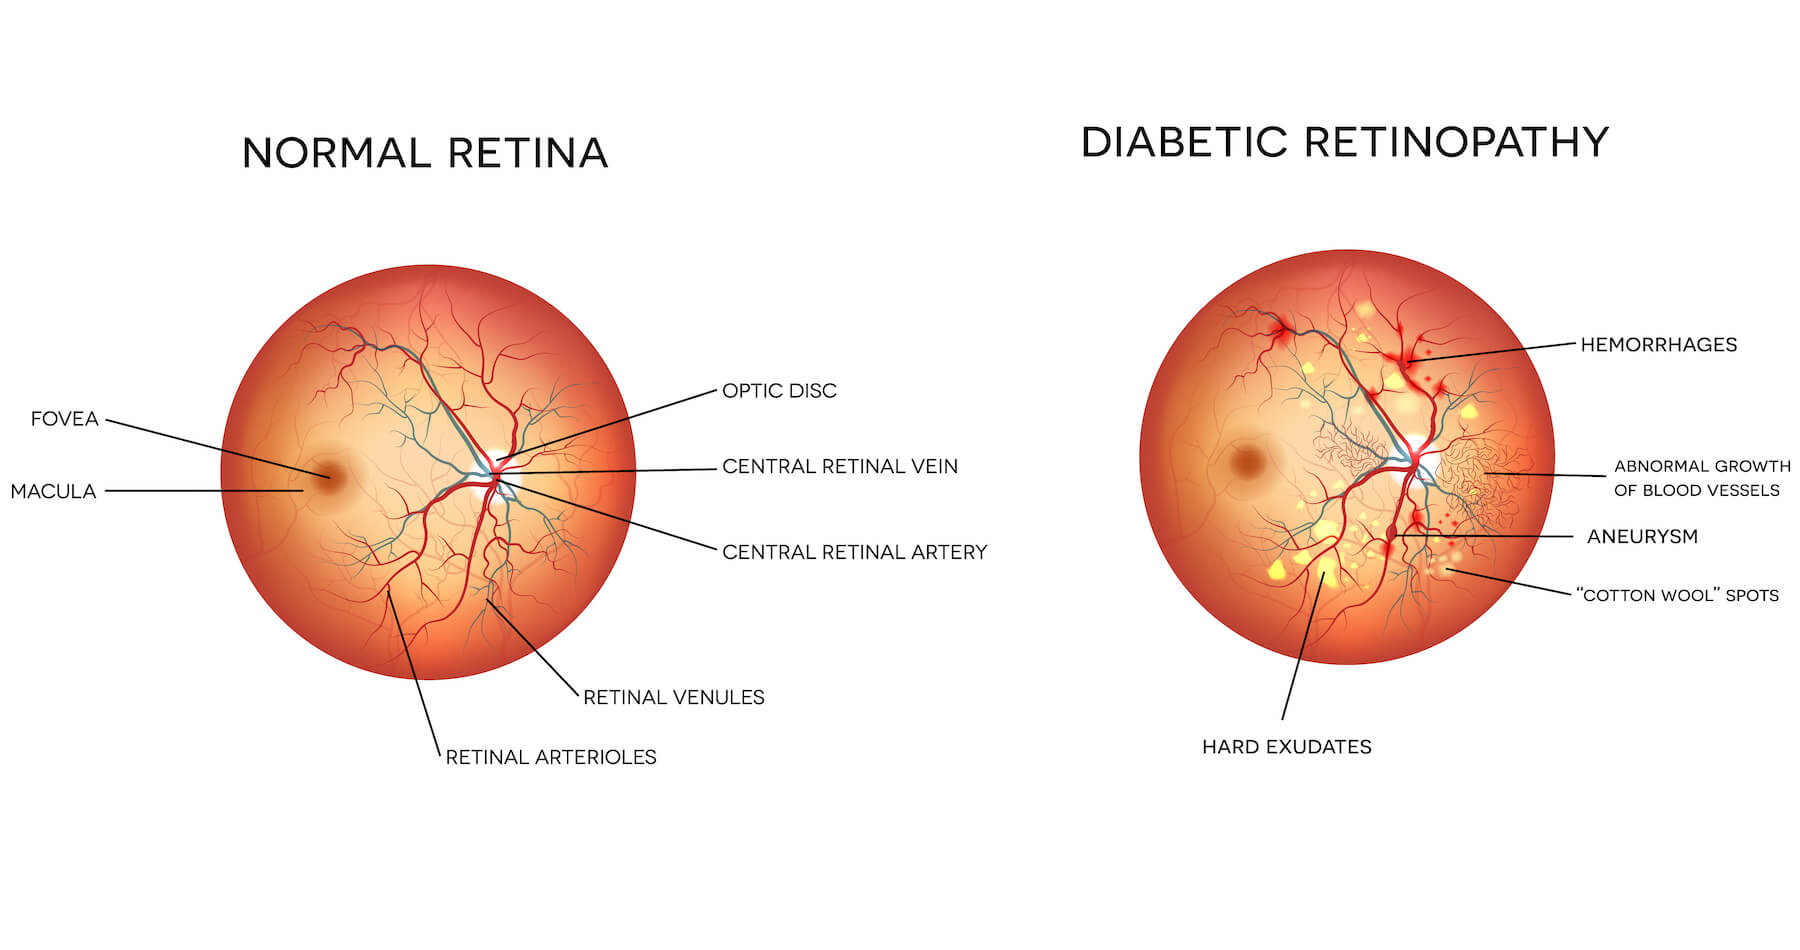 Diagram of diabetic retinopathy